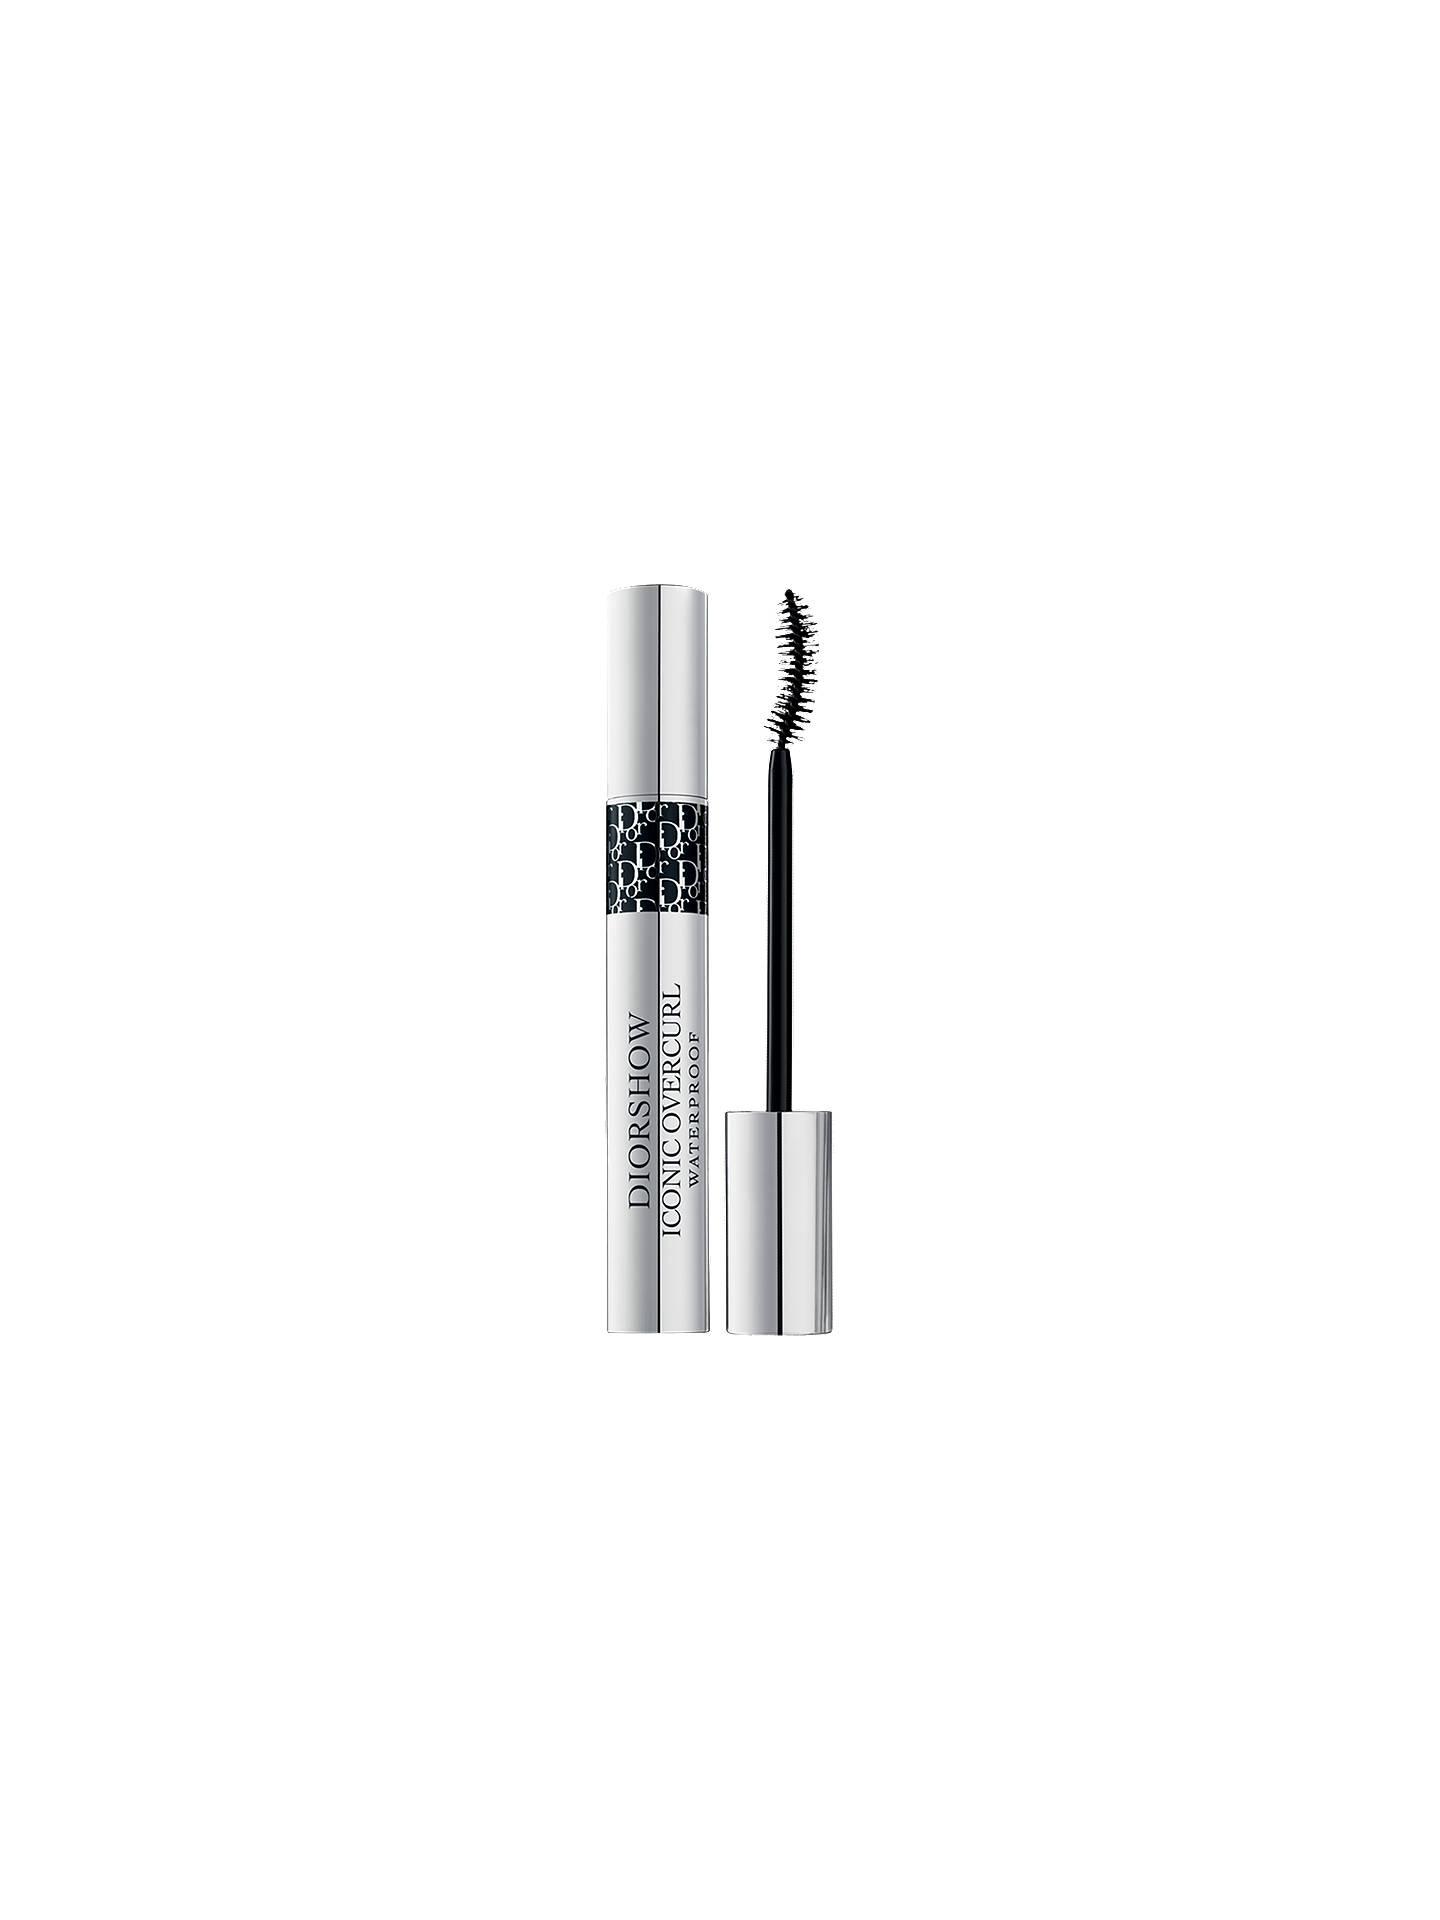 d325a795c5f Buy Dior Diorshow Iconic Overcurl Waterproof Mascara, 091 Black Online at  johnlewis.com ...